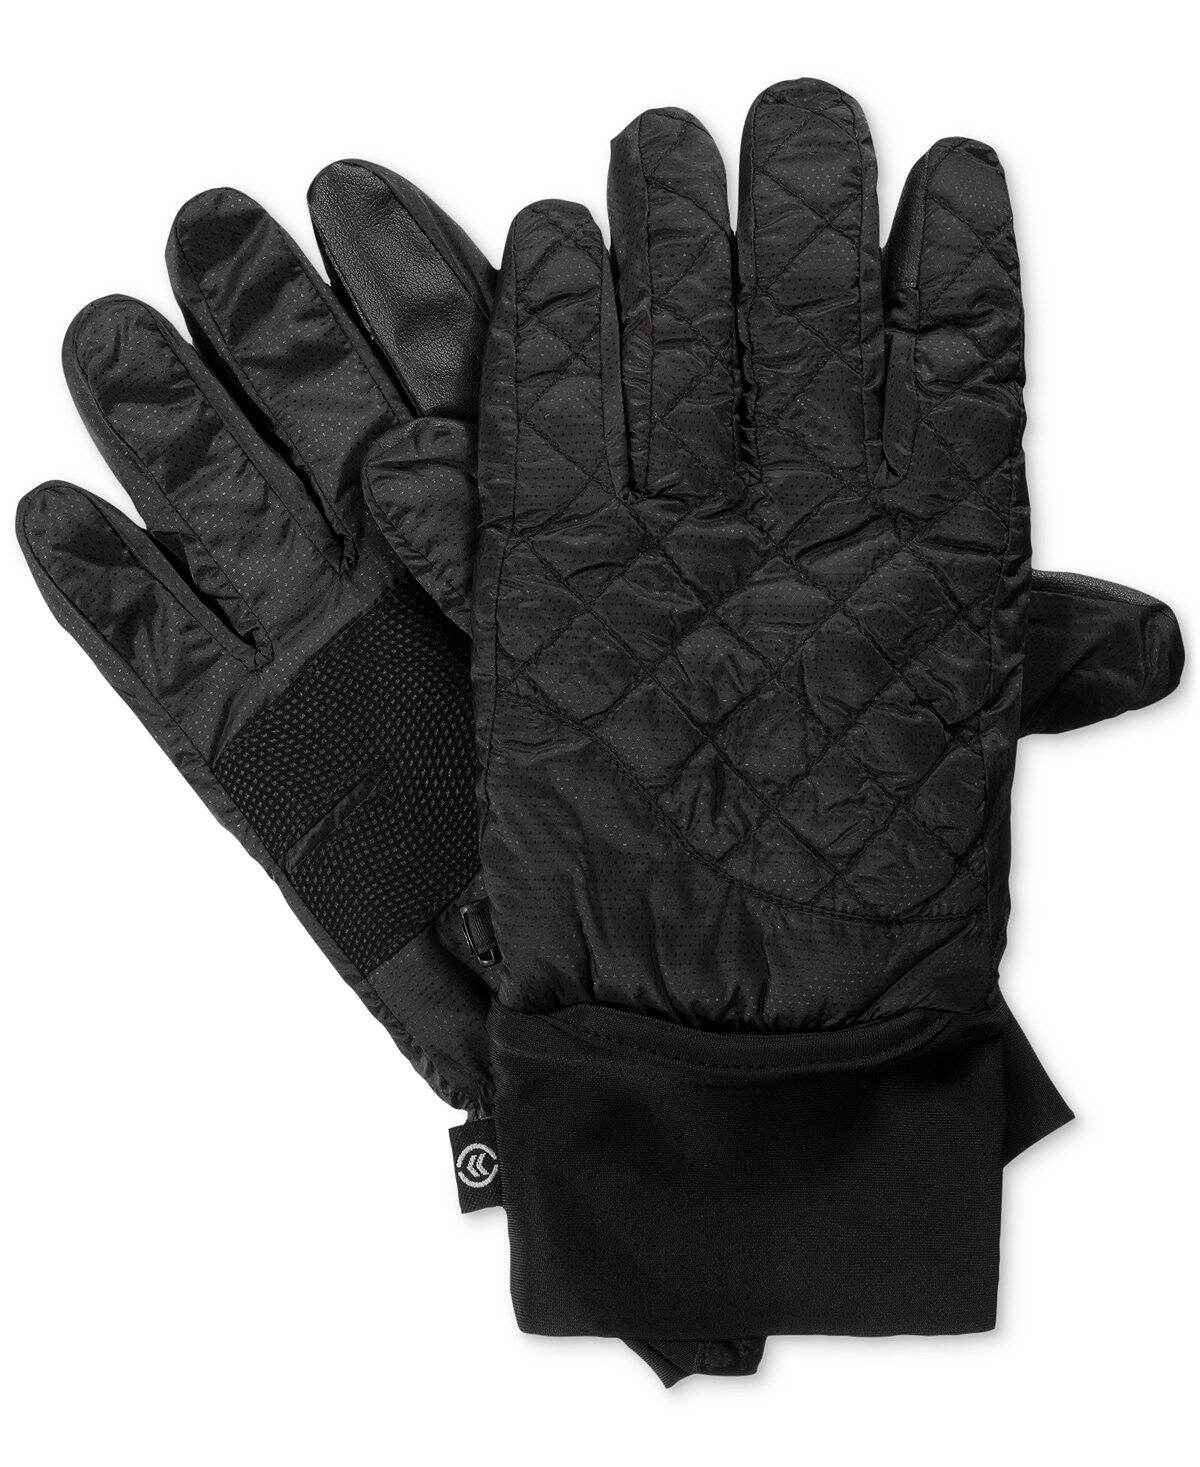 Fingerless gloves isotoner - Men S Isotoner Signature Gloves Various 4 4 Shipping Or Free